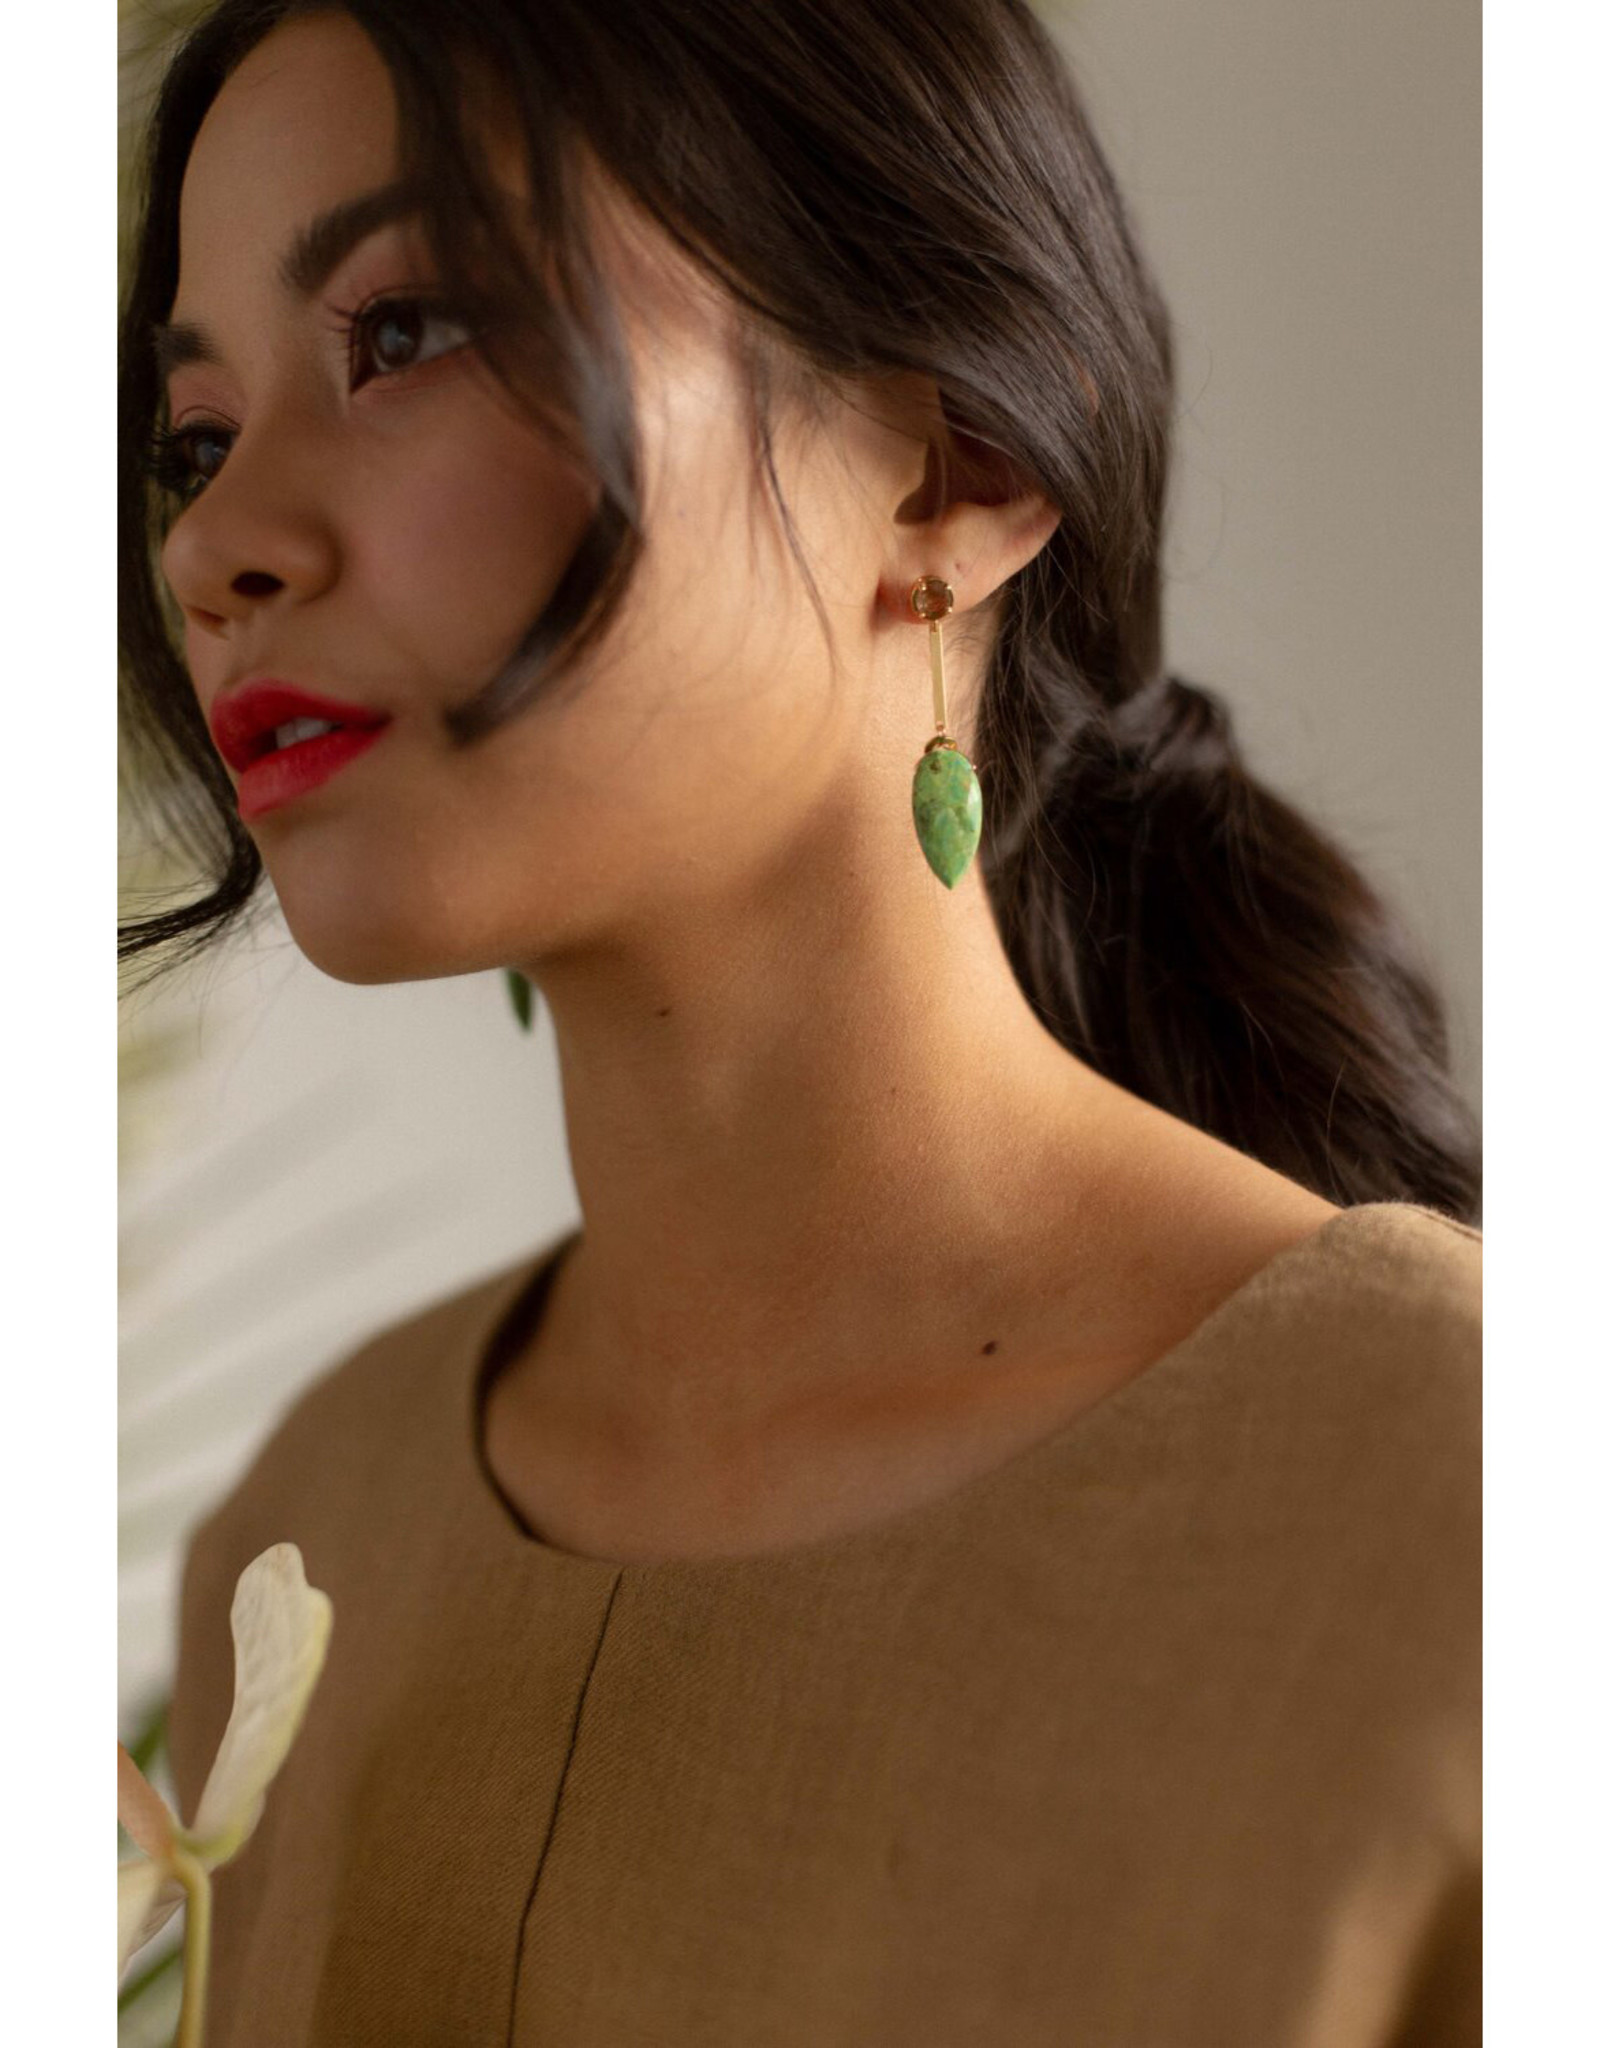 Hailey Gerrits Designs Amazon Earrings - Green Turquoise